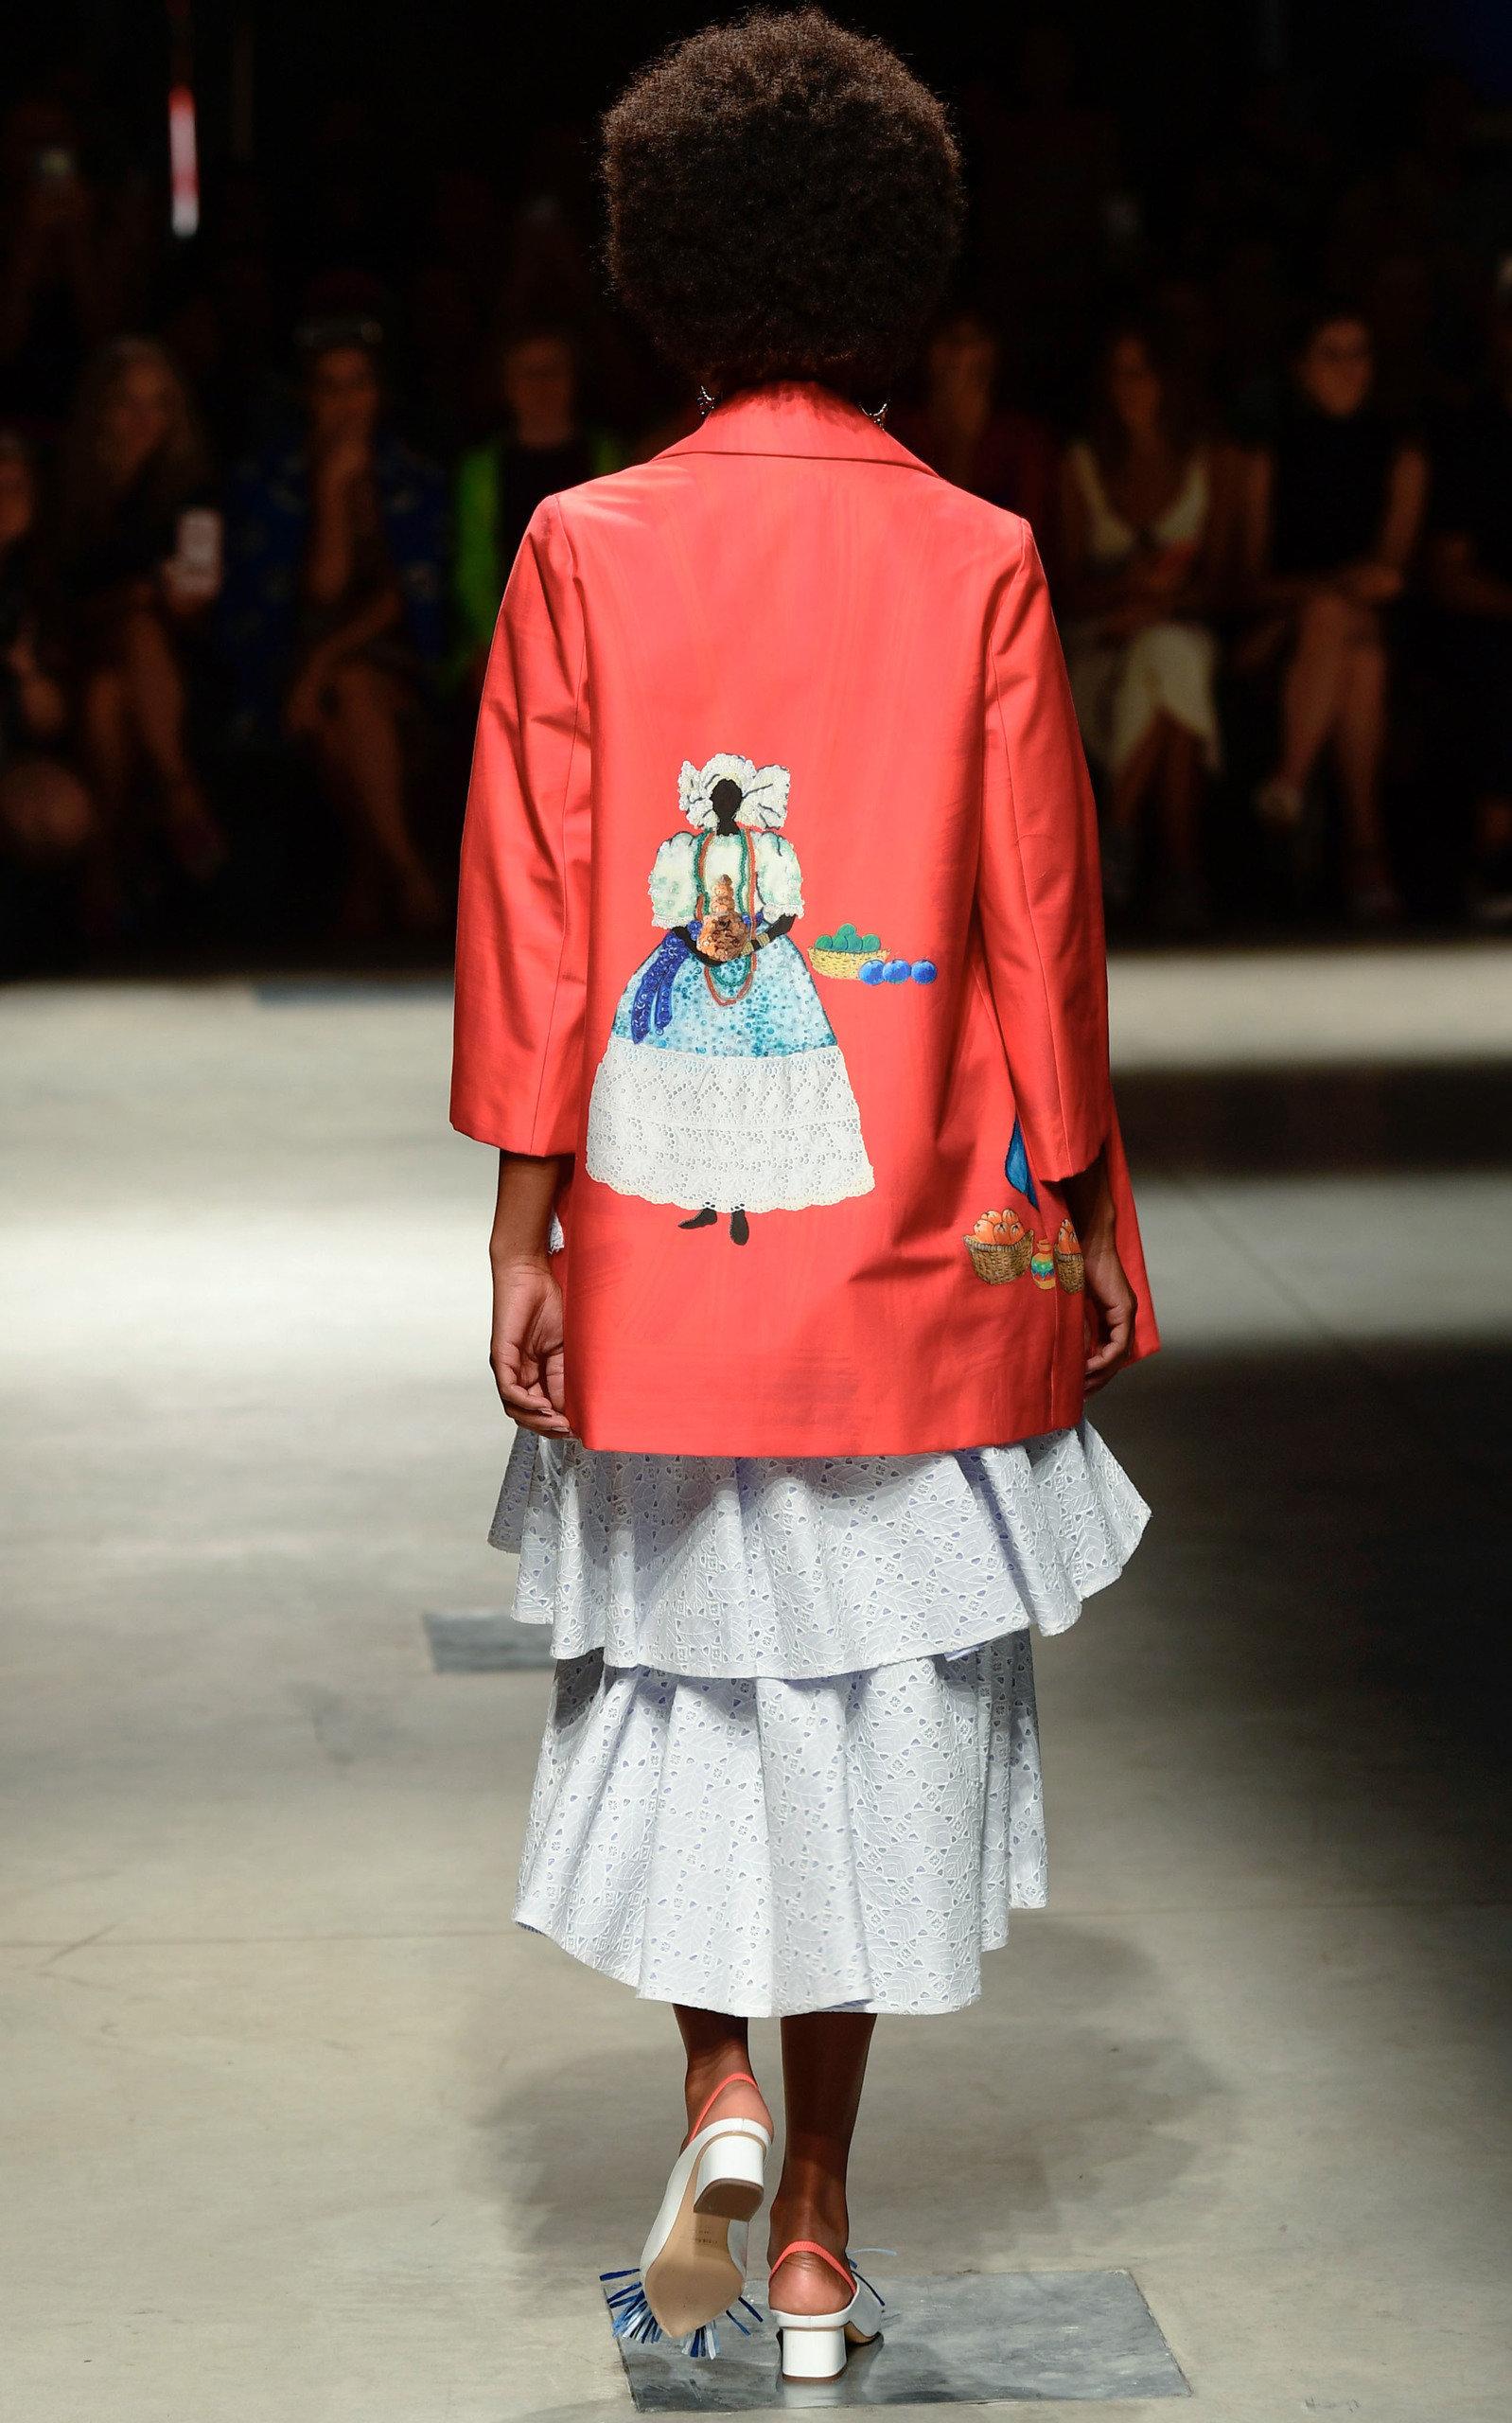 67f290faba Stella JeanSangallo Midi Skirt. CLOSE. Loading. Loading